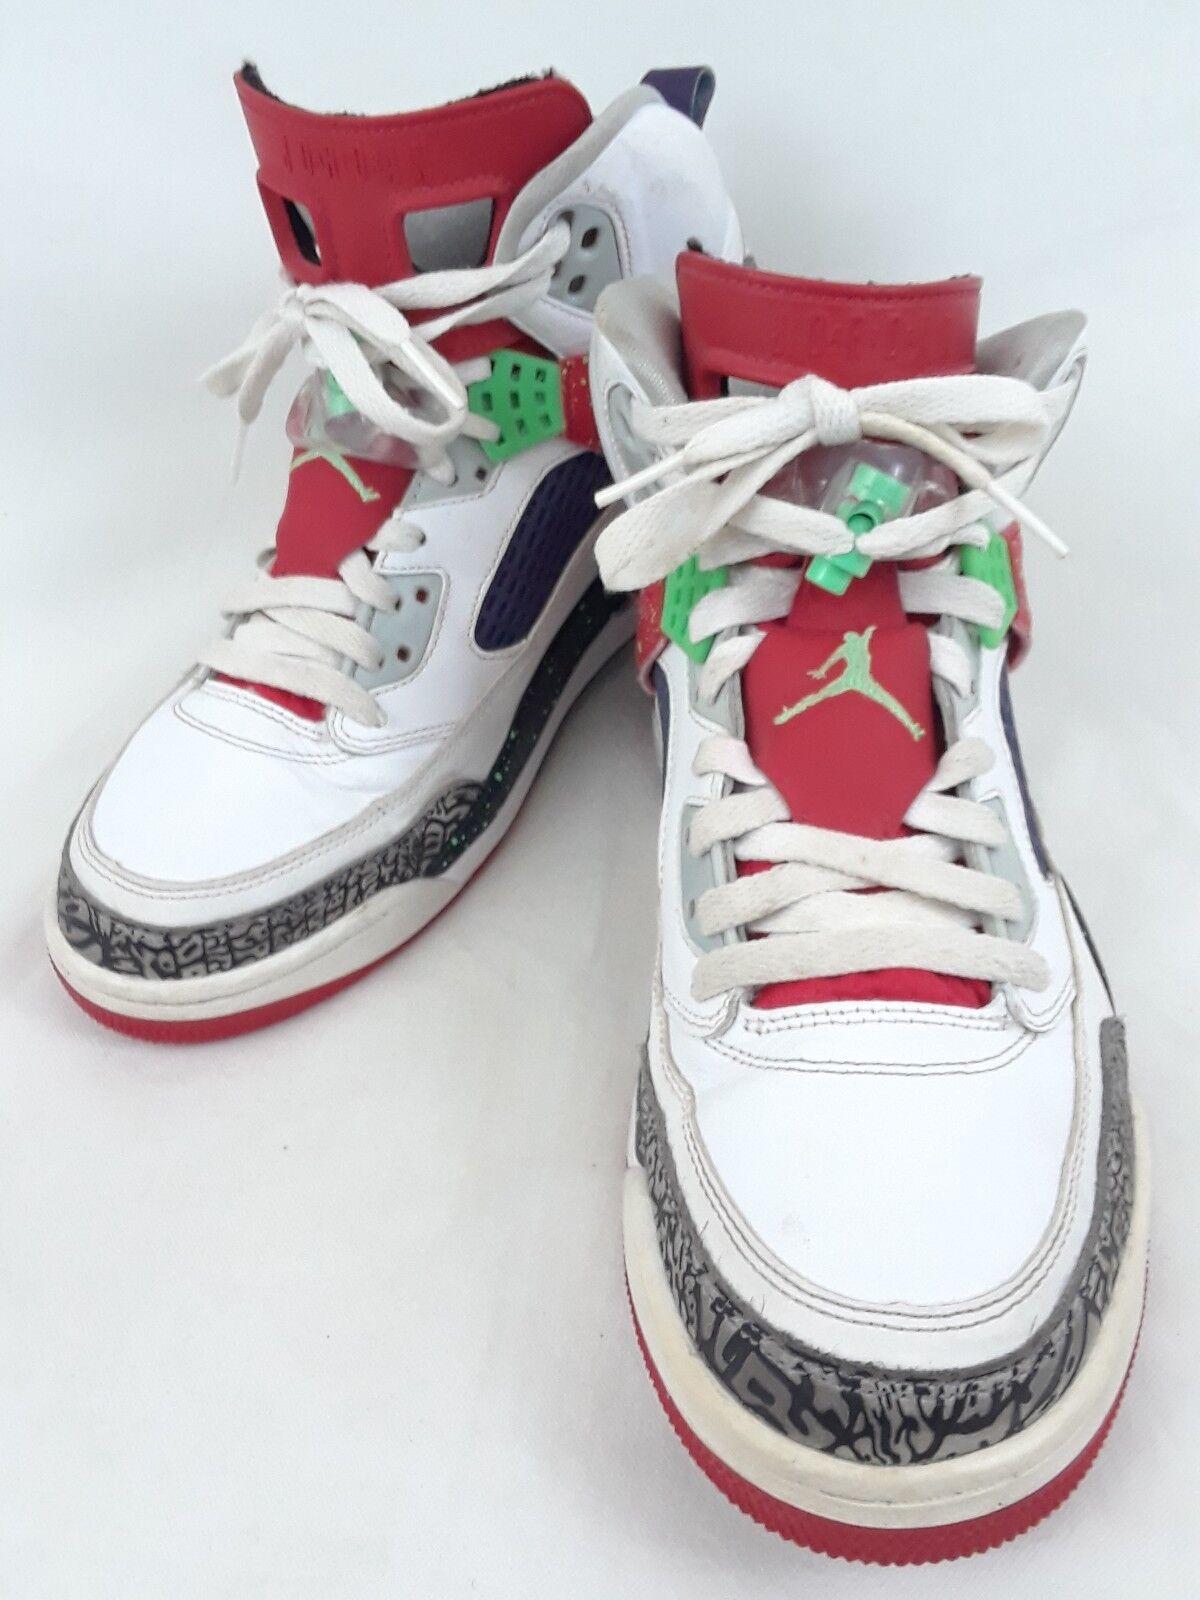 Nike air jordan spizike 315371-132 bianco / rosso / veleno uomini verdi 'sz carino!